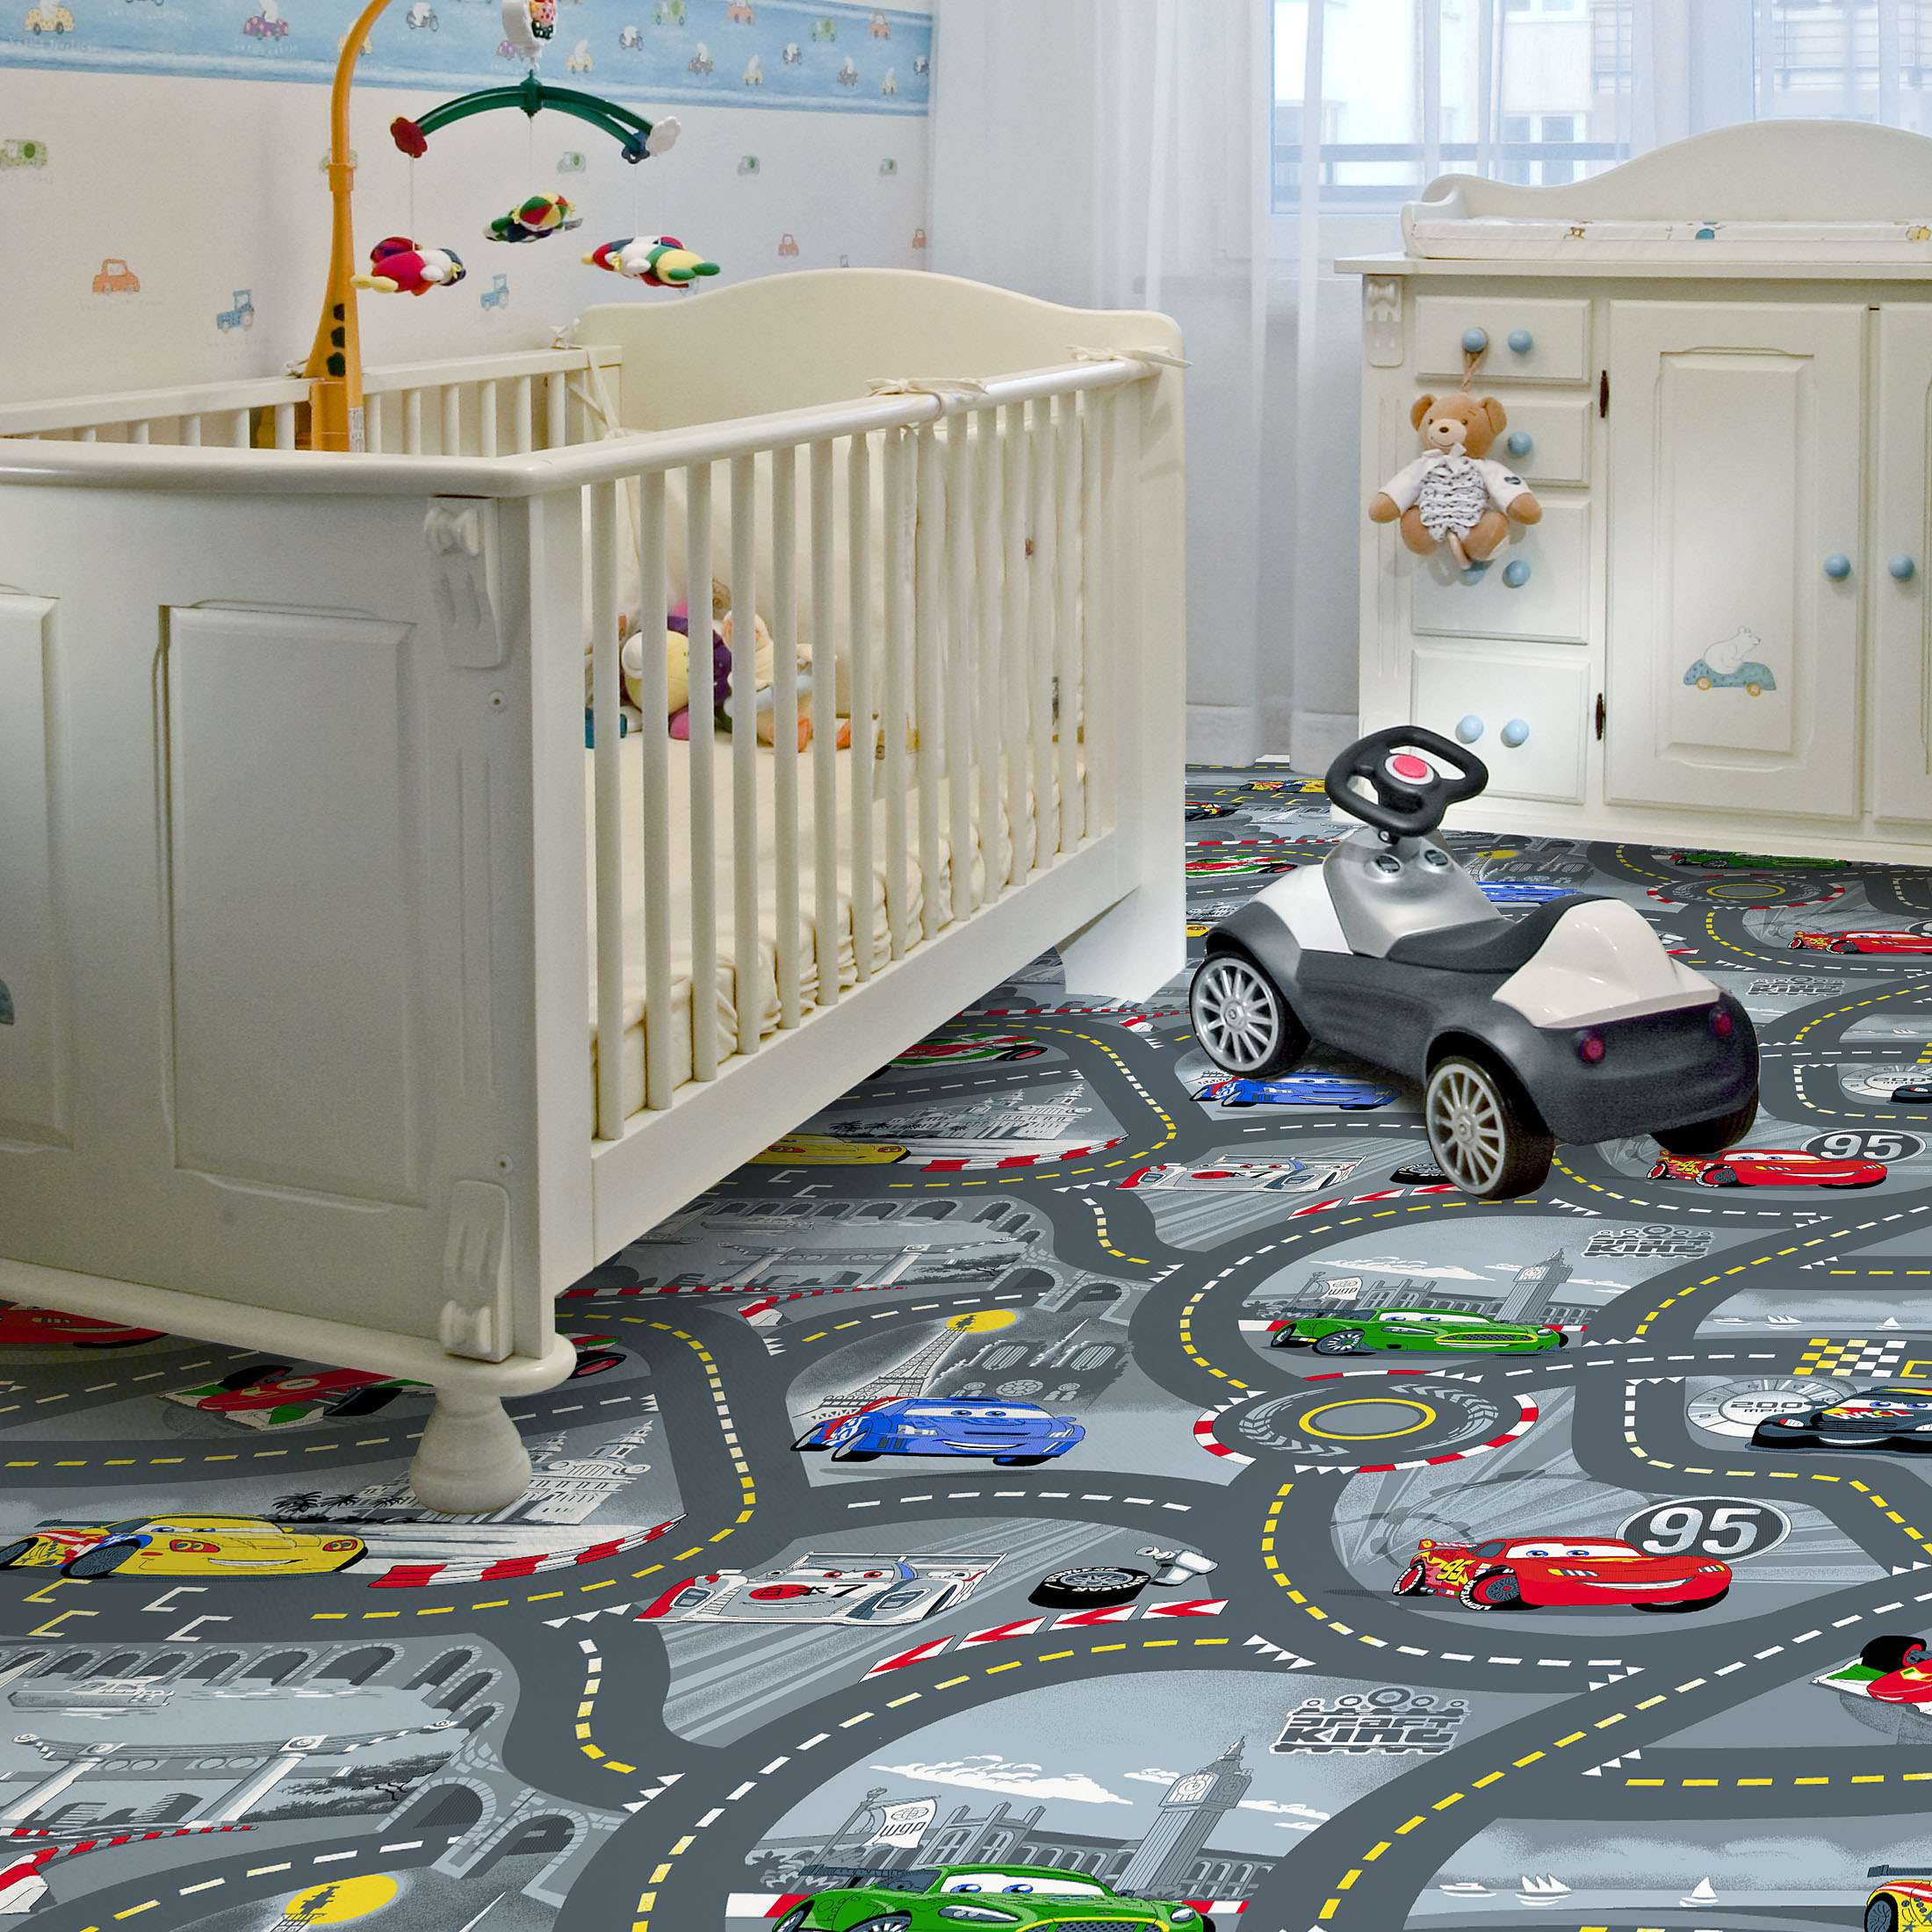 Full Size of Teppichboden Kinderzimmer Cars 2 Von Kibek In Grau Regale Regal Weiß Sofa Kinderzimmer Teppichboden Kinderzimmer